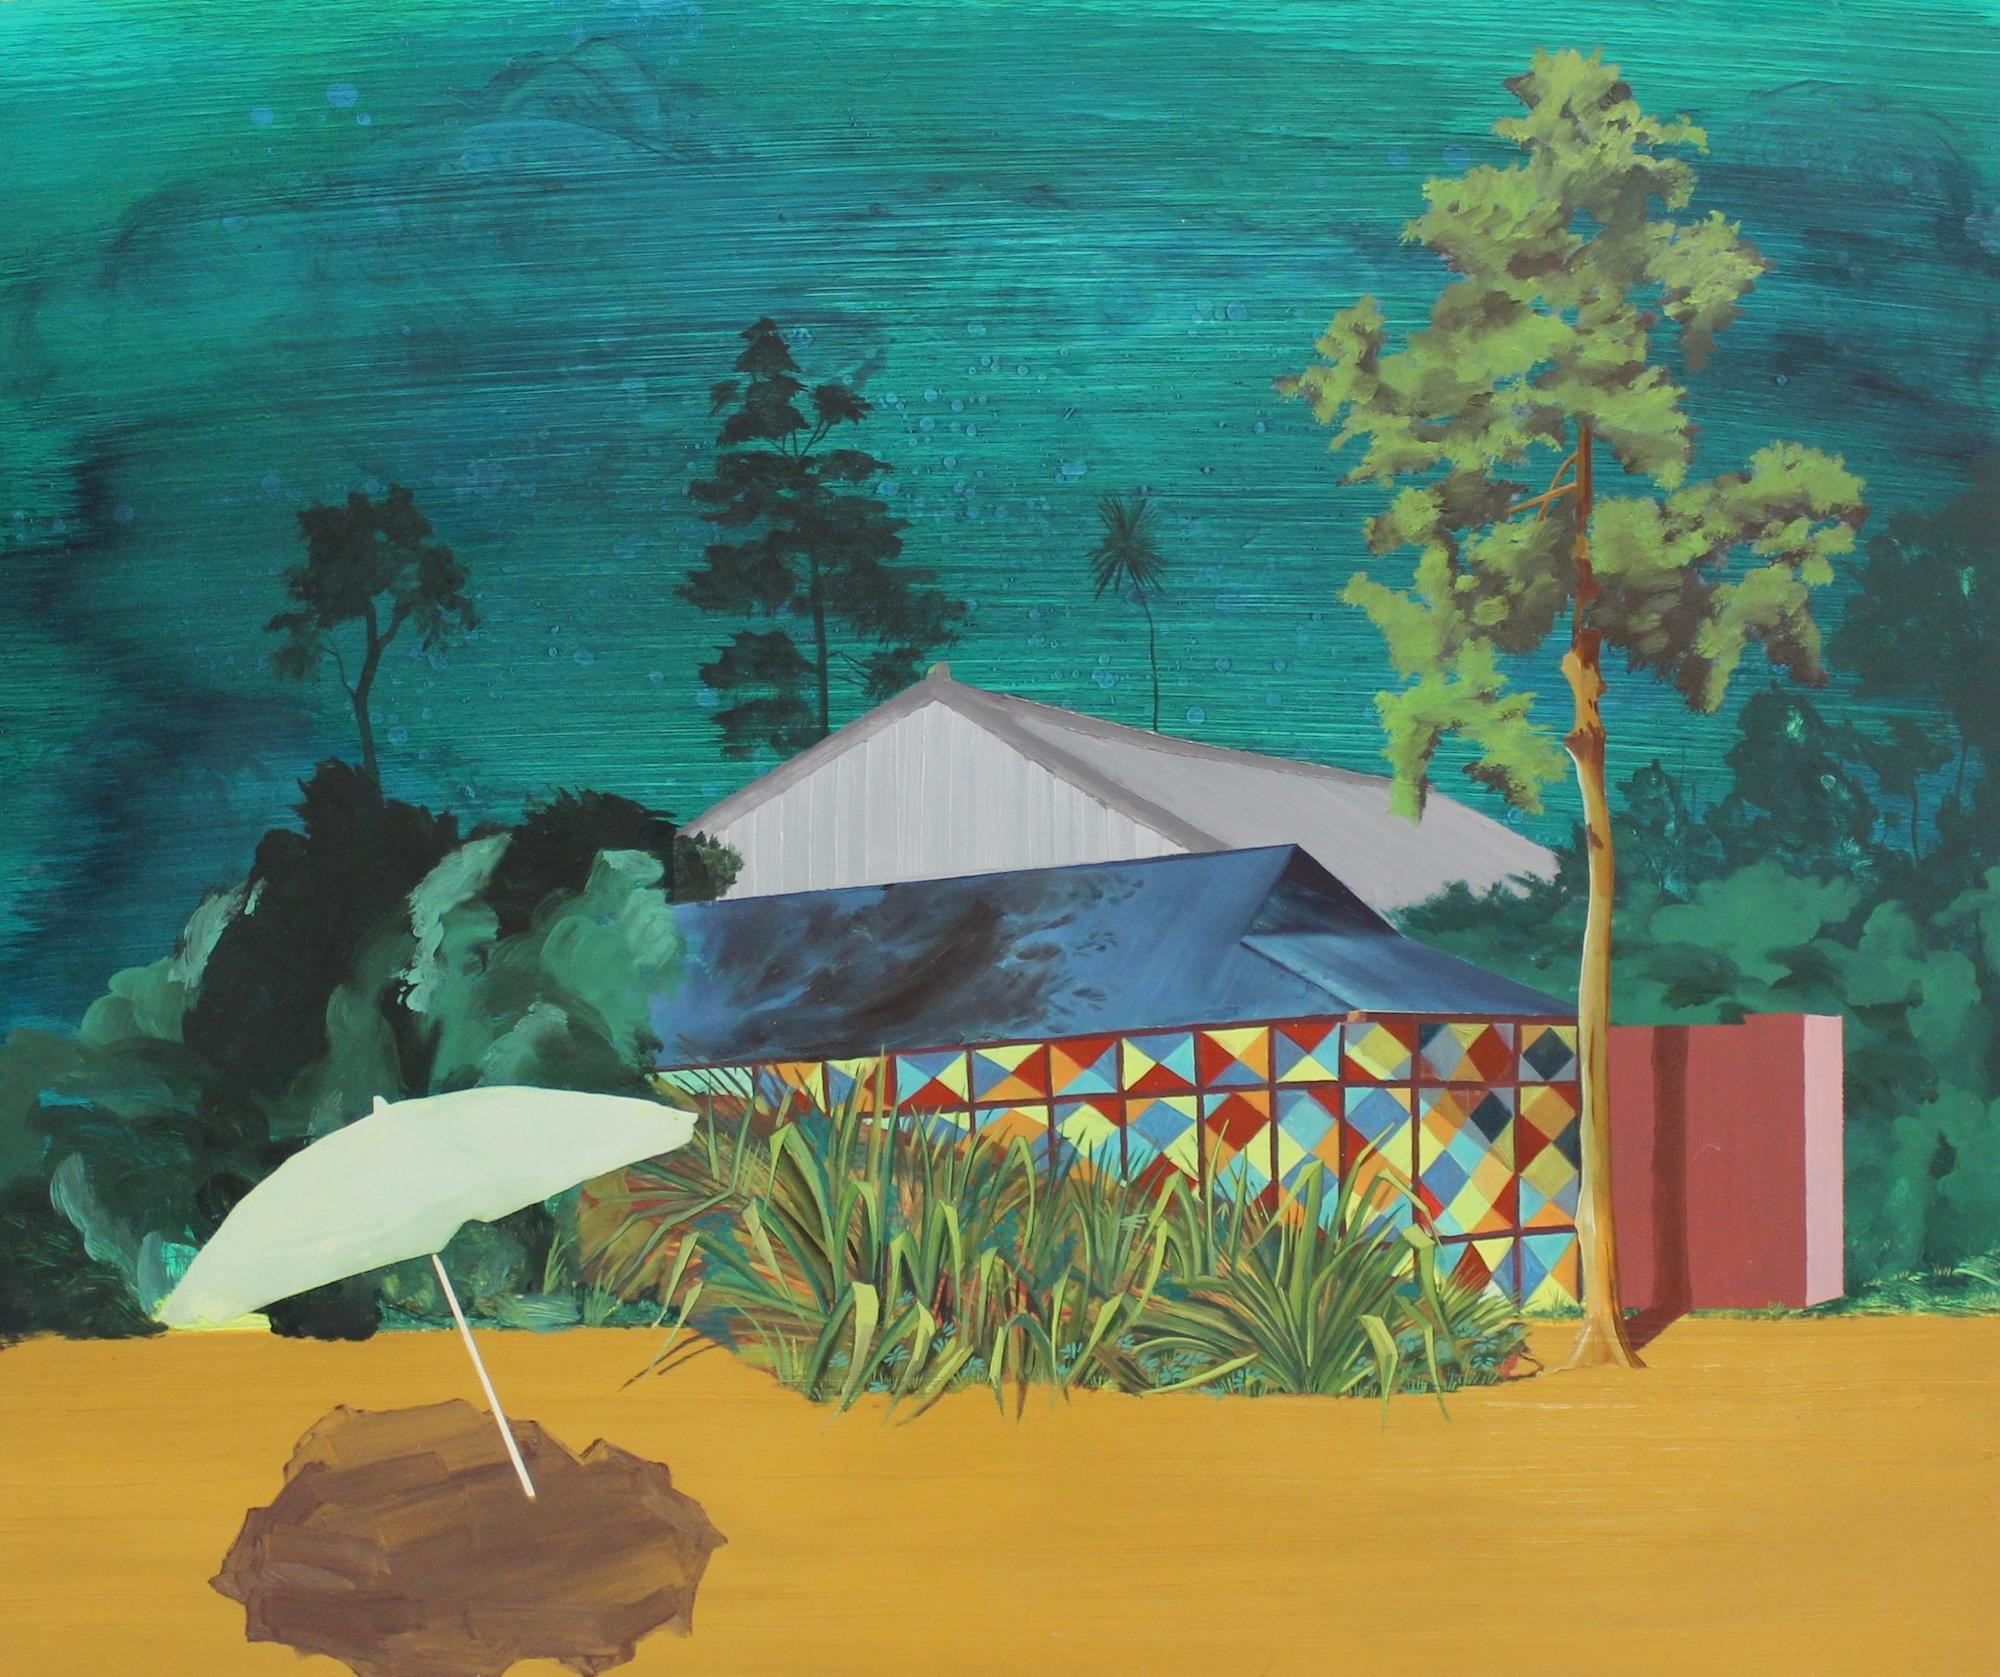 Strand, Oil on Panel, 2017, 50 x 60cm